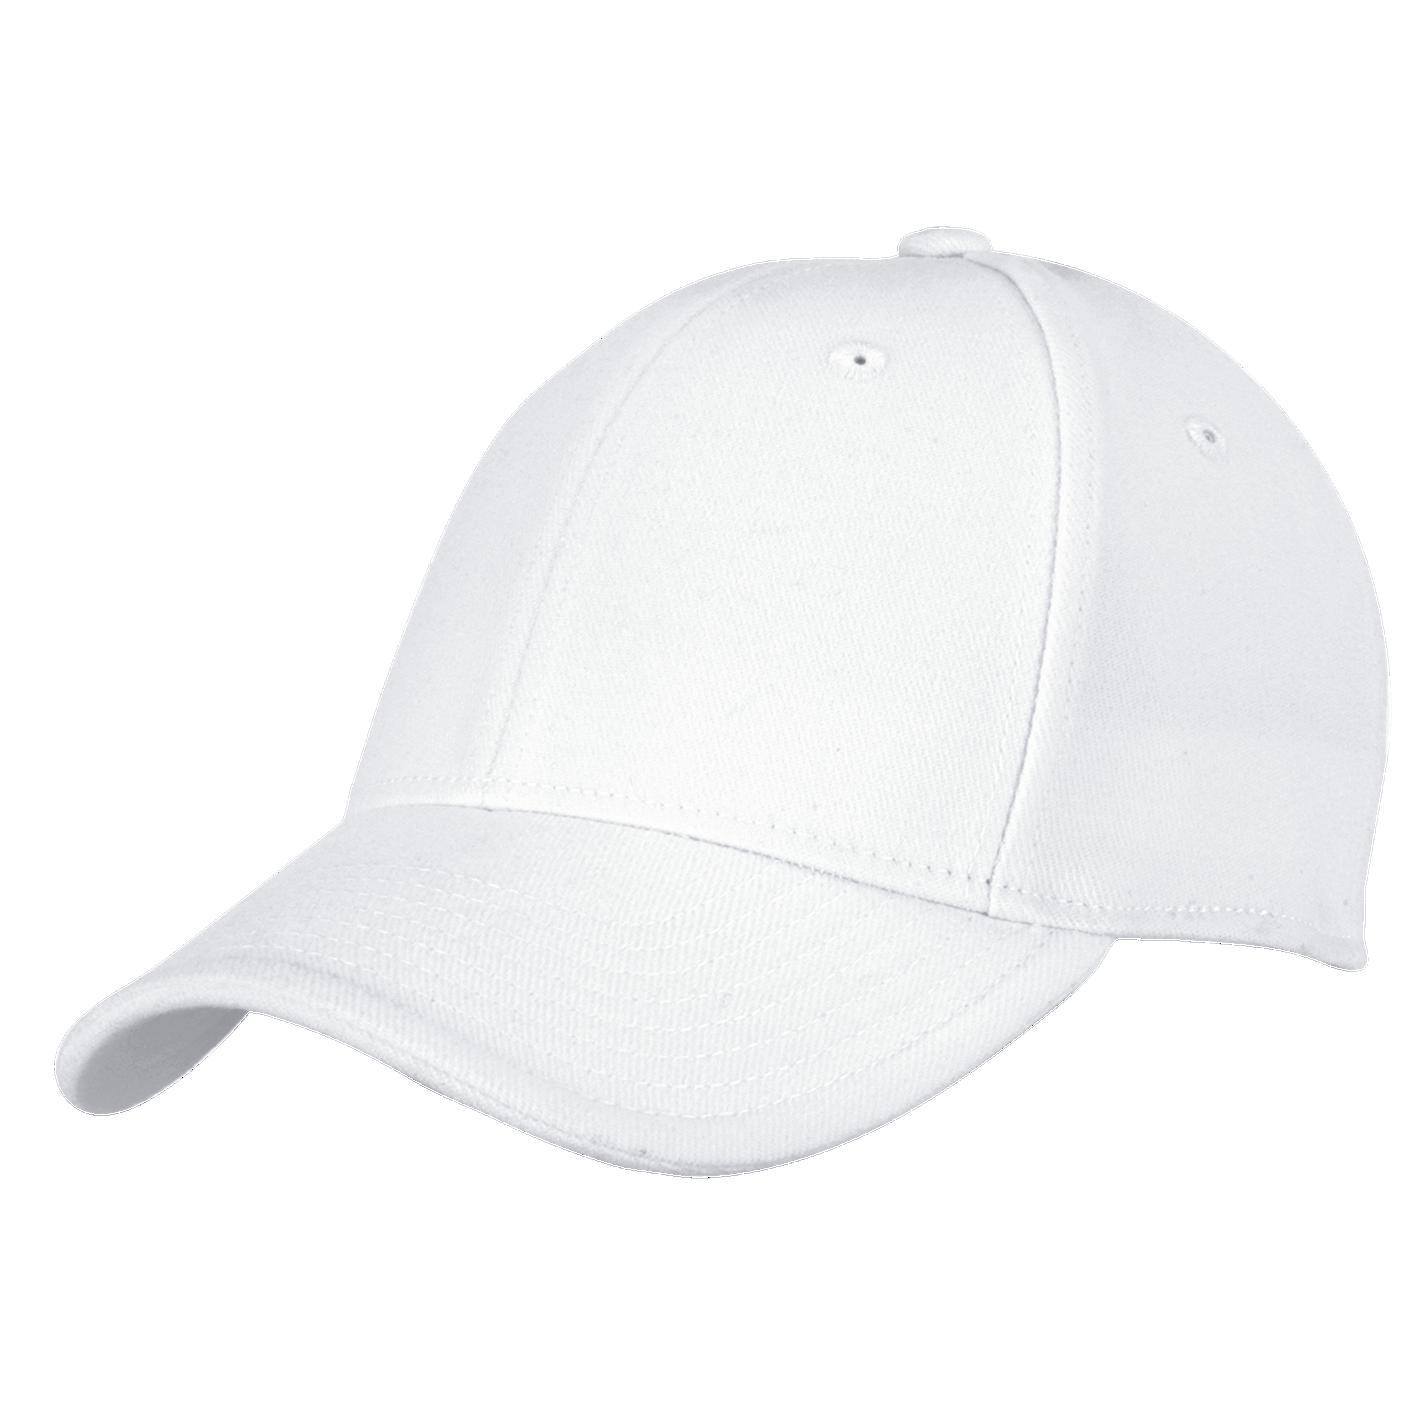 adidas Team Structured Flex Cap - Men s - For All Sports ... 2628dfe87dbb